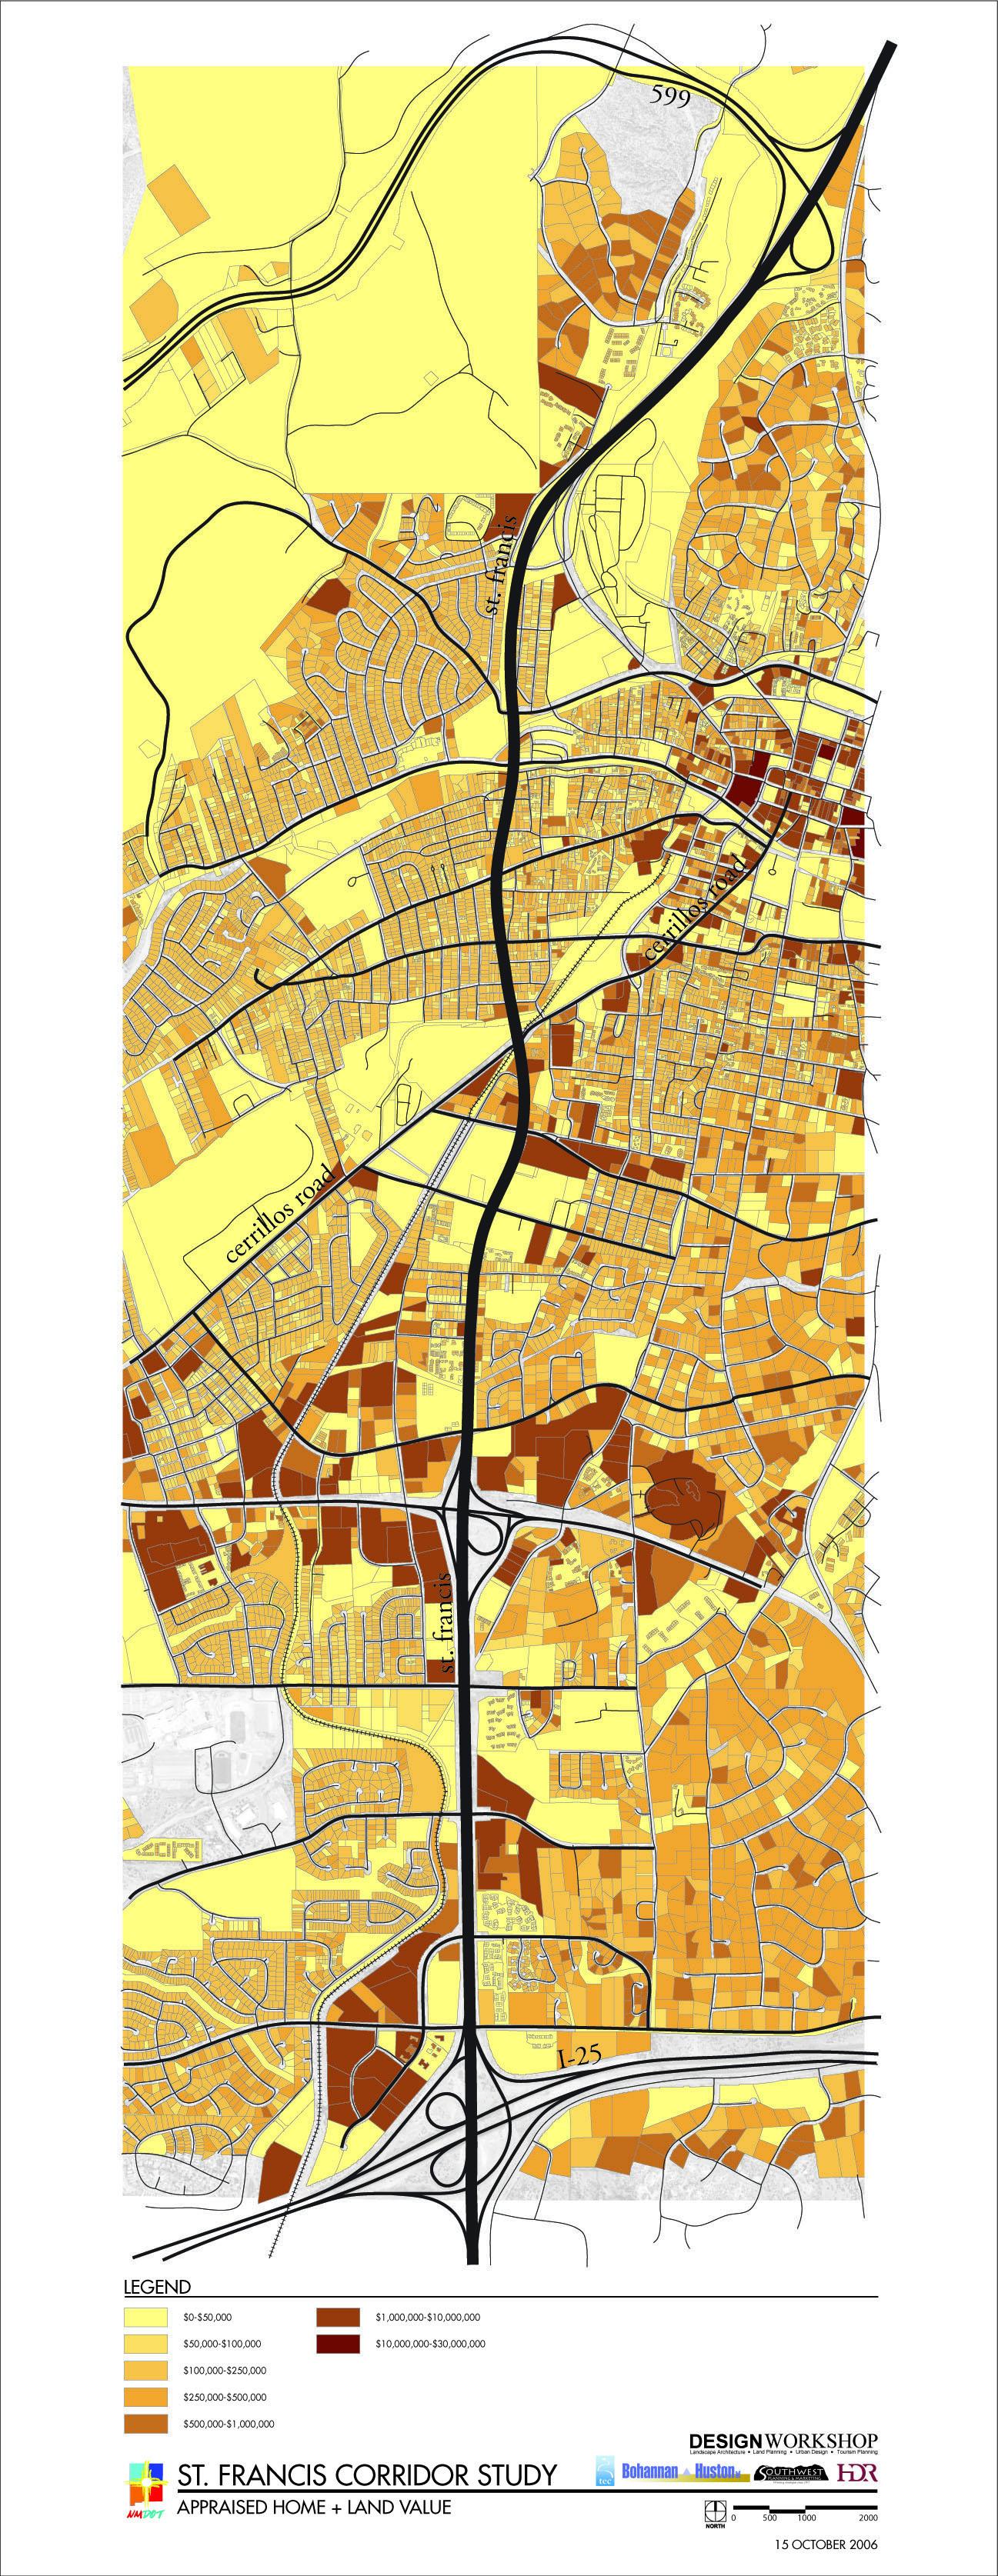 sfc_diagrams_land-value.jpg